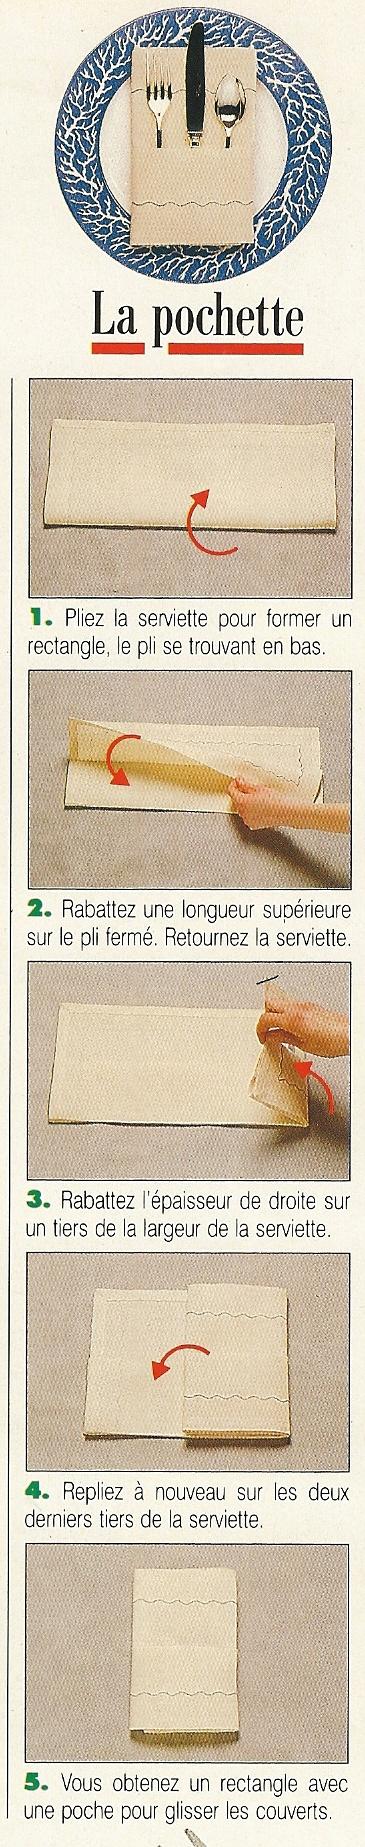 Best 20 pliage serviette ideas on pinterest pliage de serviettes pliage d - Pliage de serviette accordeon ...